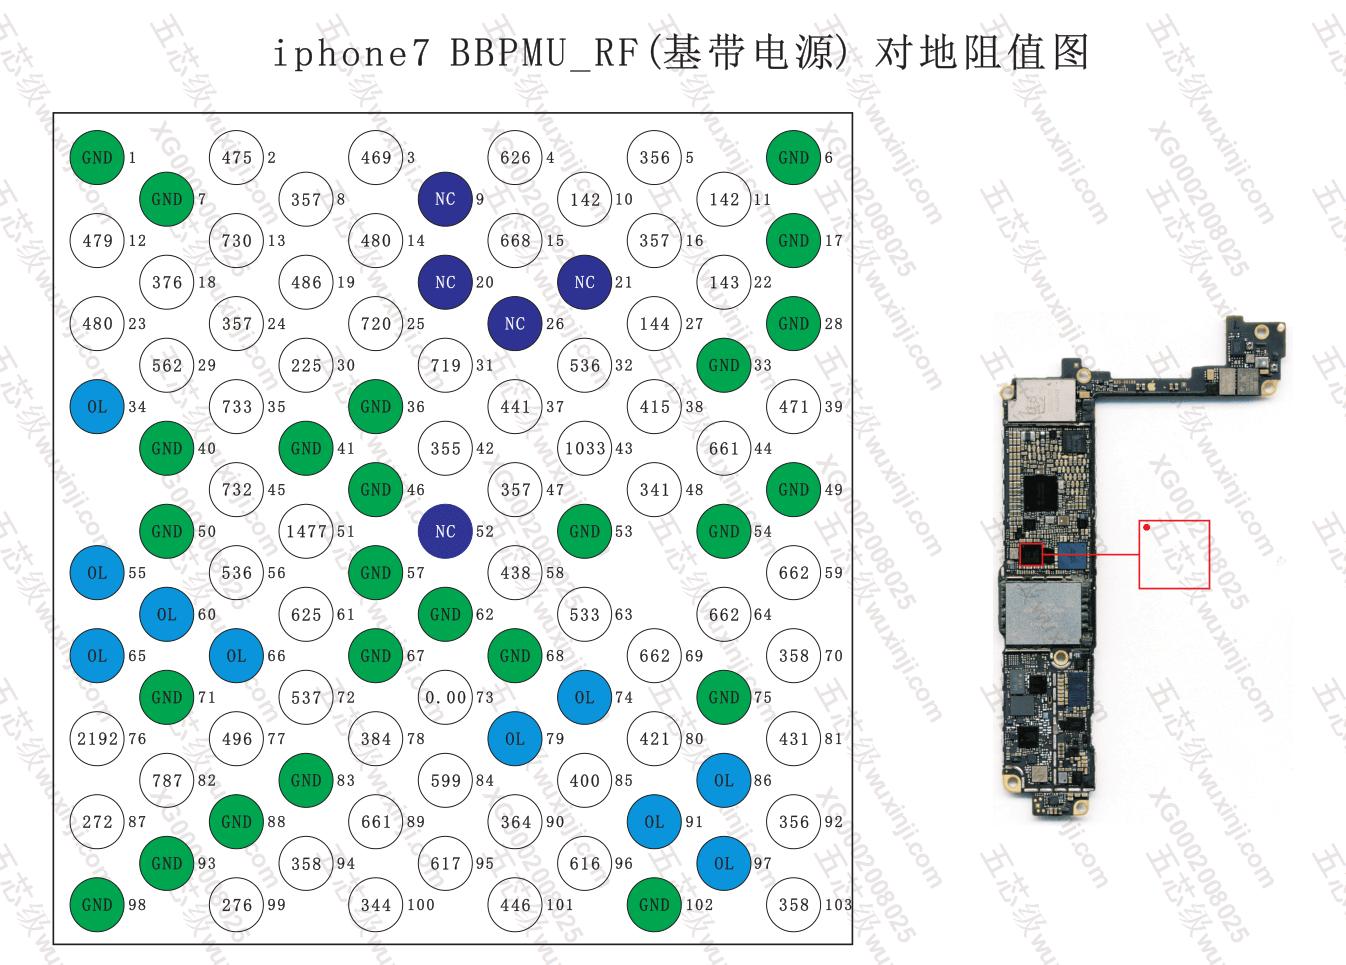 BBPMU_RF IC nguồn Baseband iPhone 7 - I Can Fix